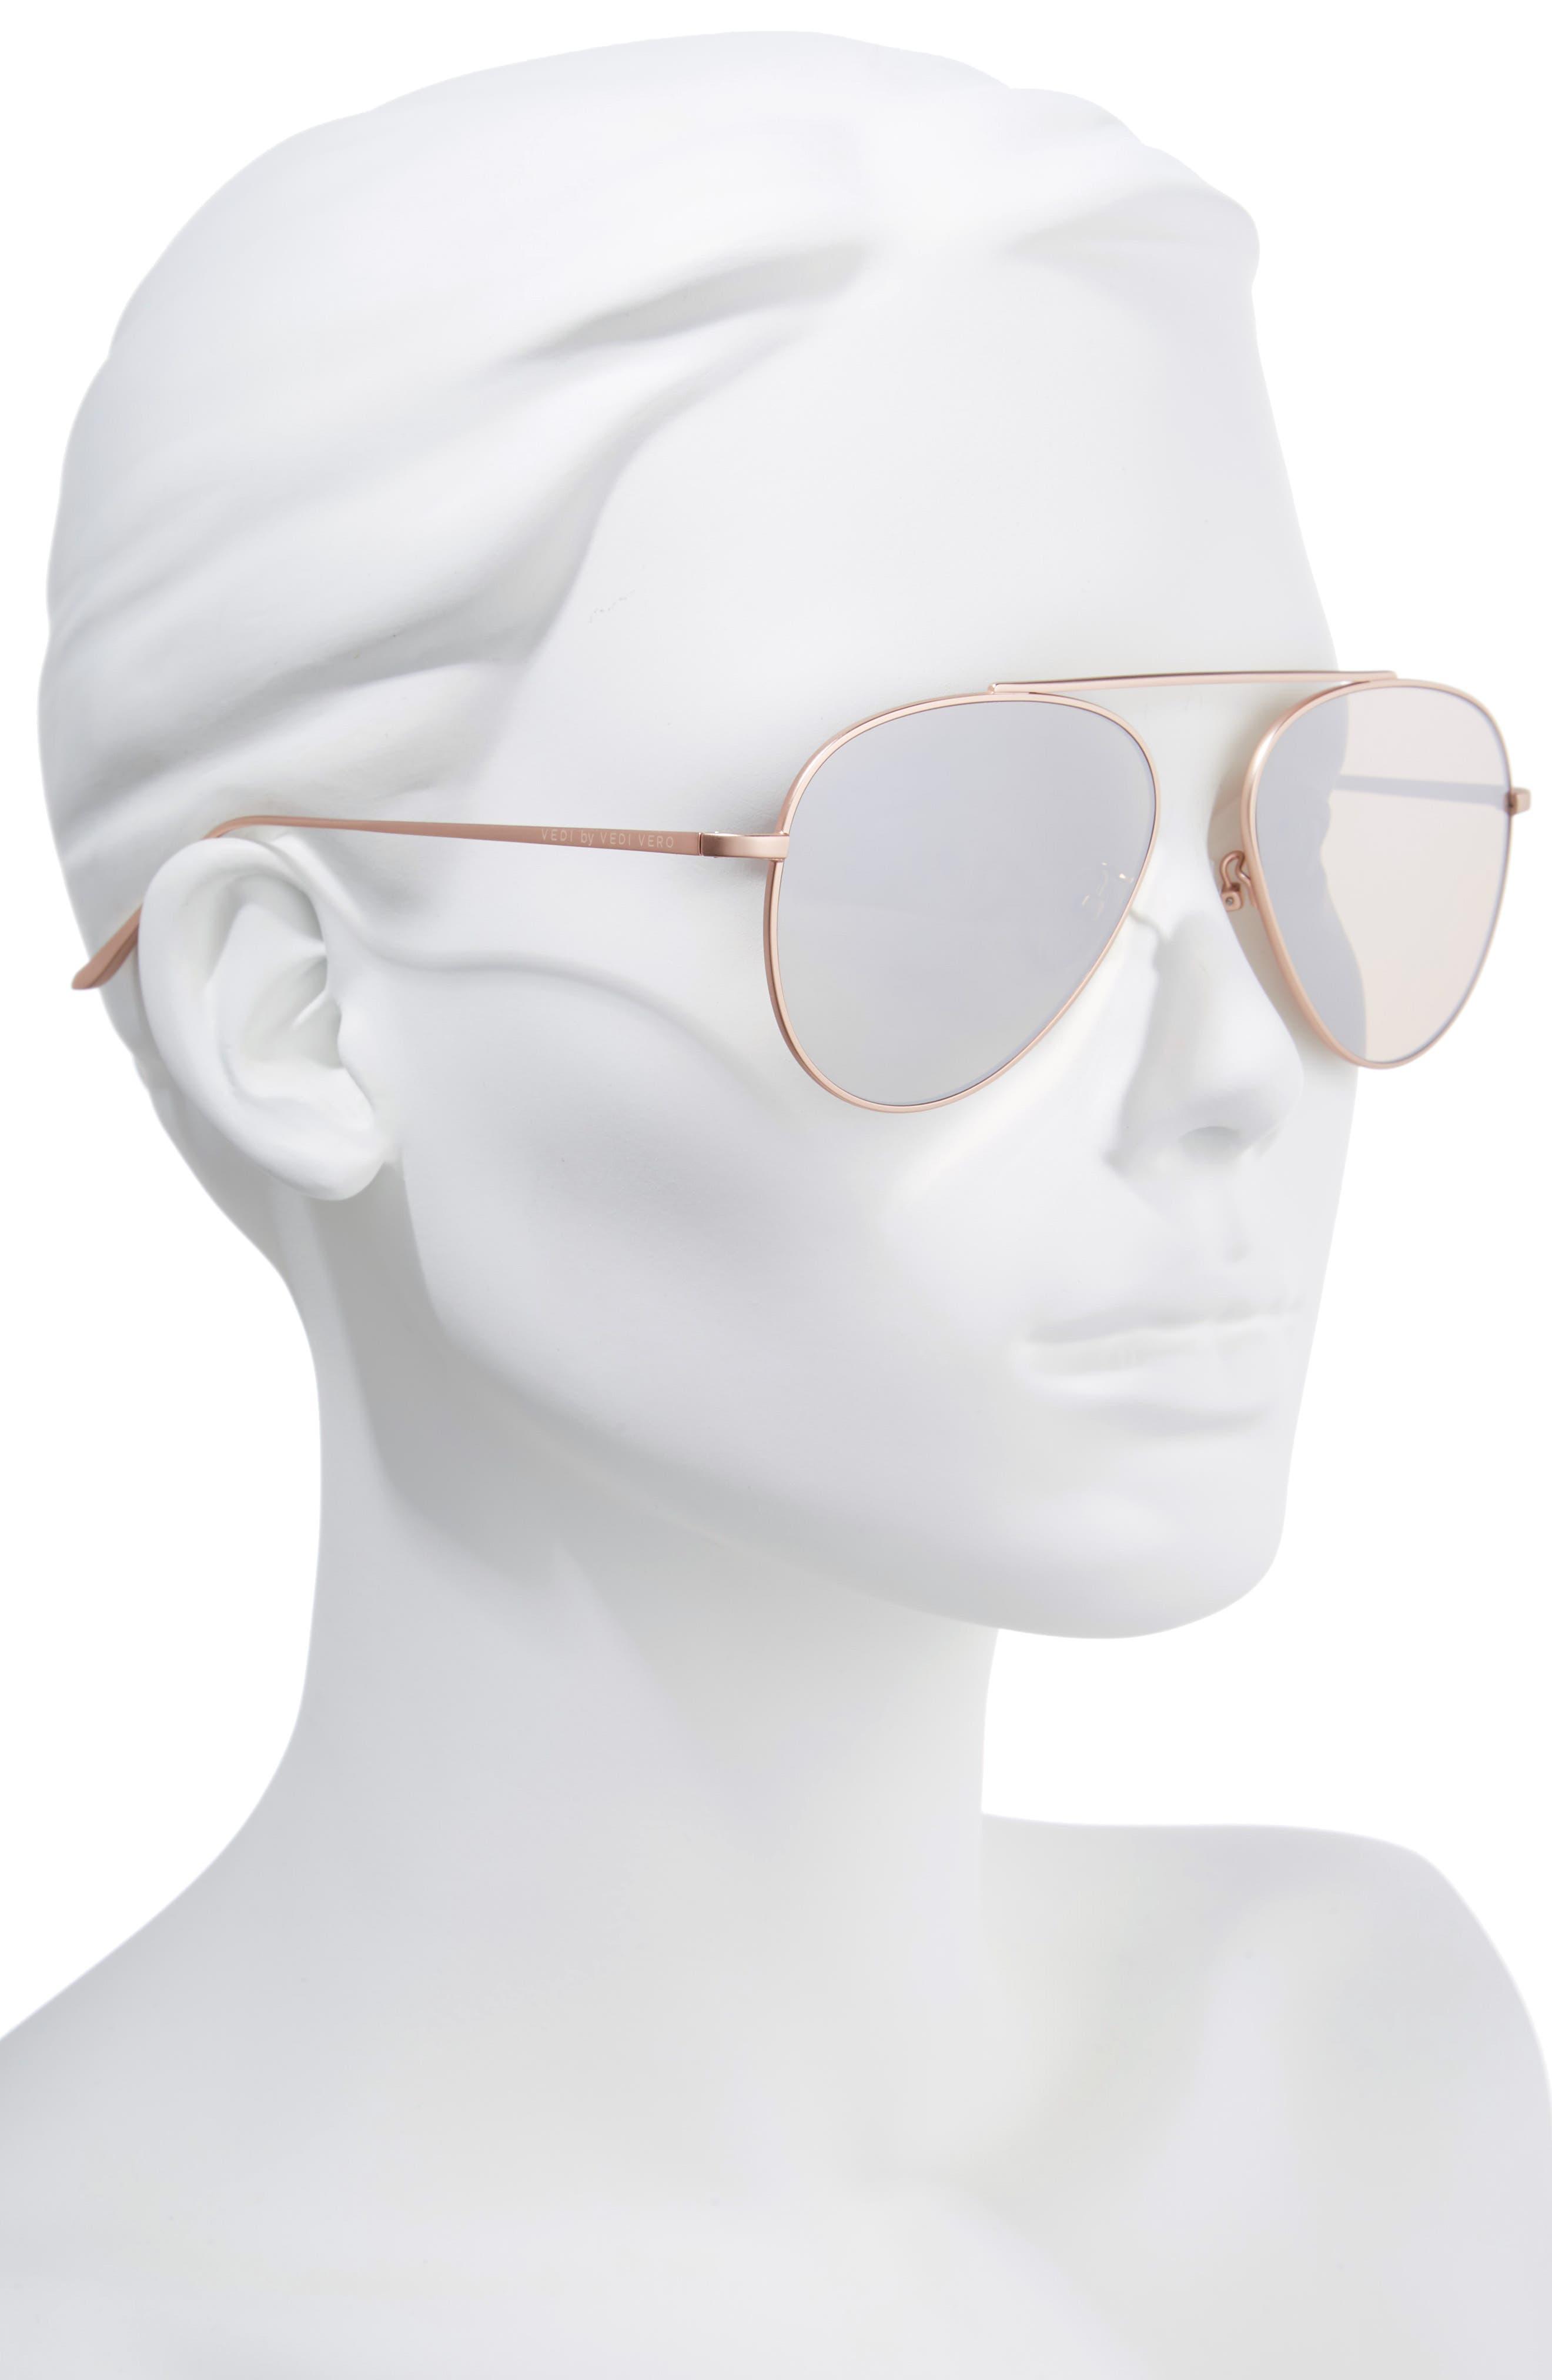 59mm Metal Aviator Sunglasses,                             Alternate thumbnail 2, color,                             ROSE GOLD/GOLD MIRROR